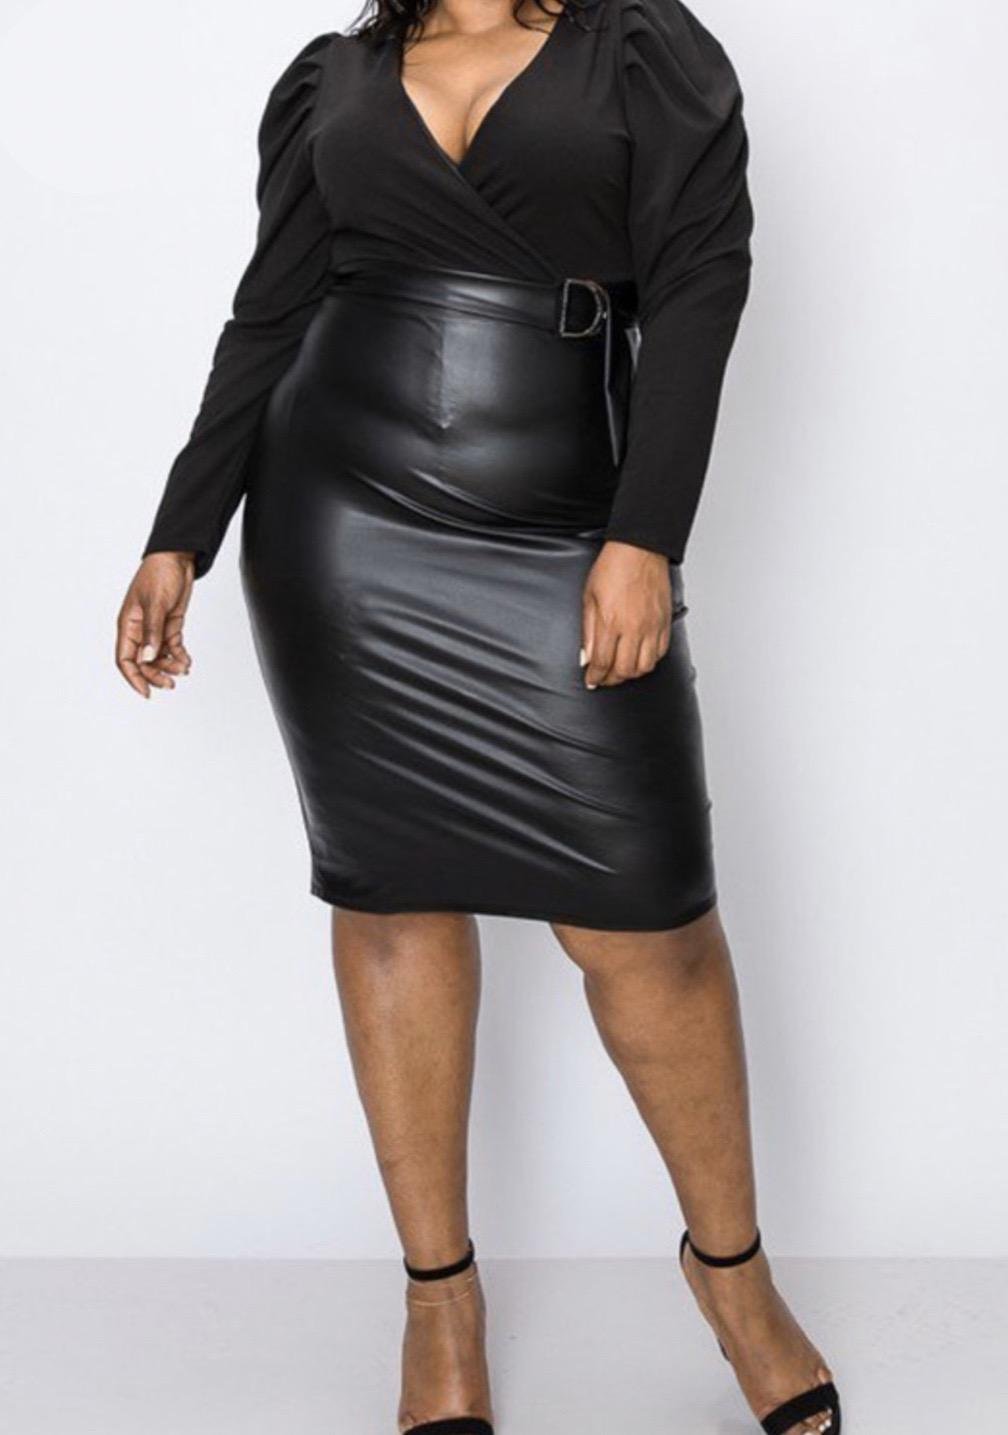 Marajah Belted Faux Leather Dress UPDR781-MARAJAH